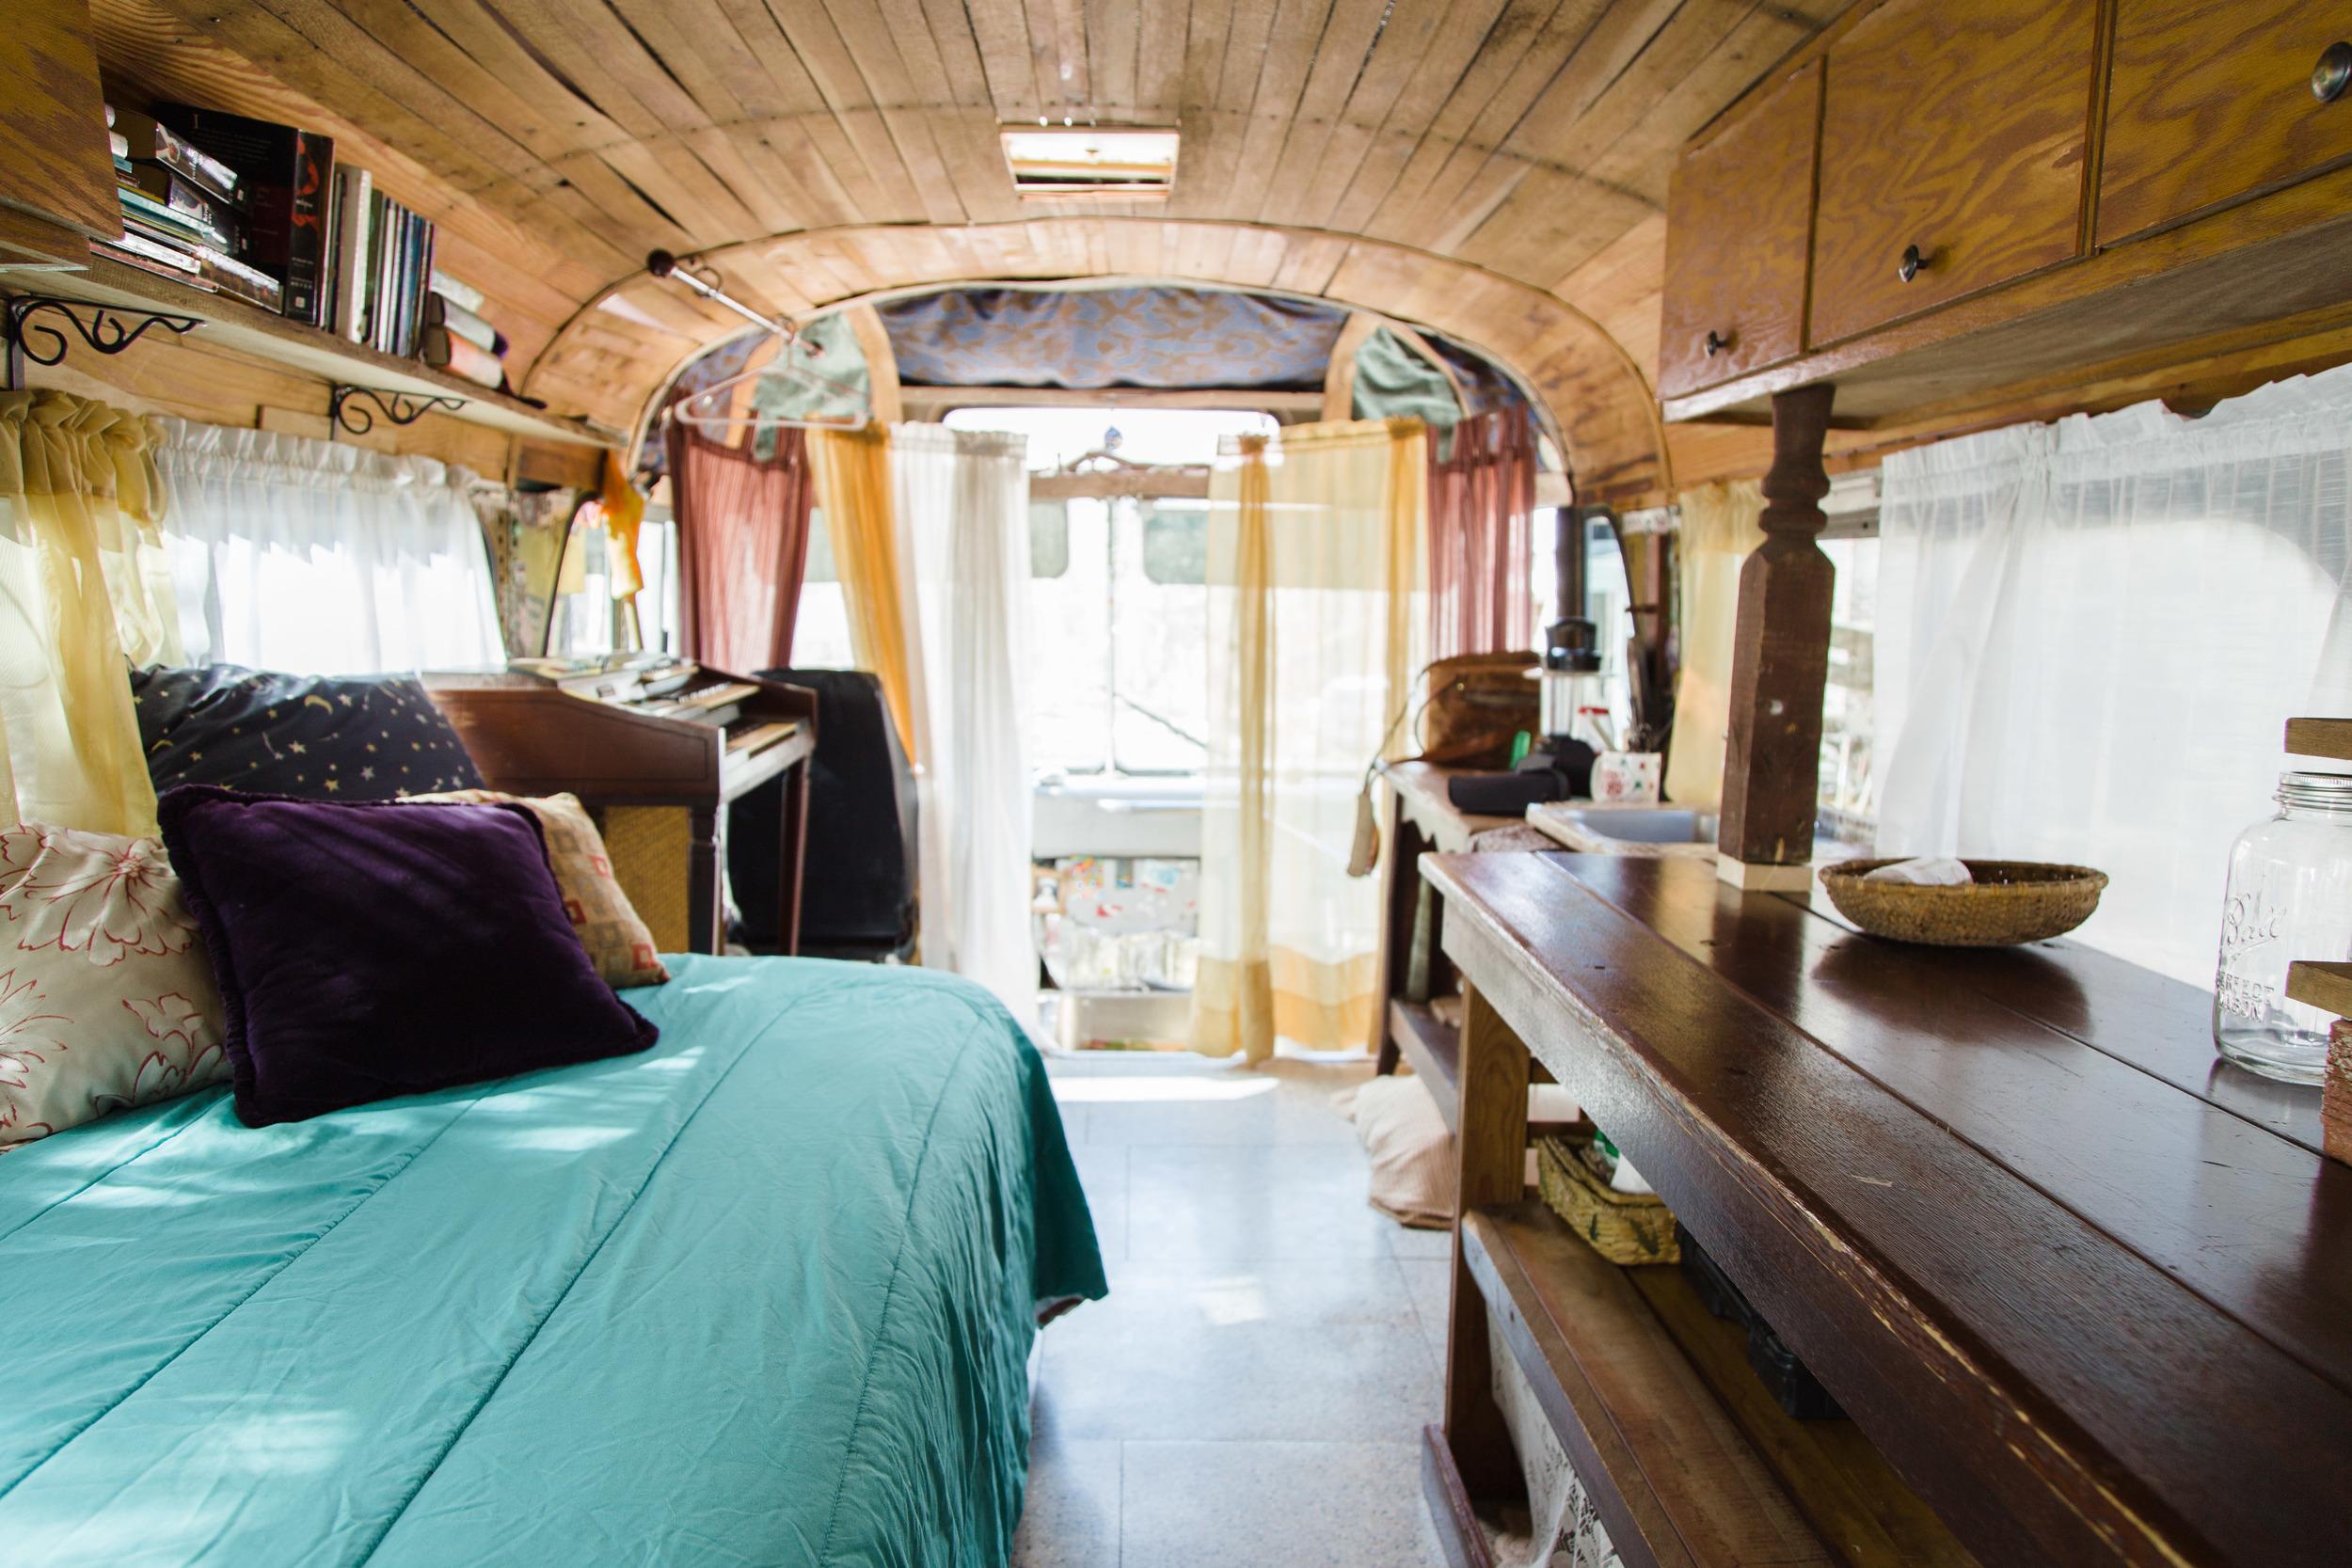 Bus Airbnb, Pittsboro North Carolina